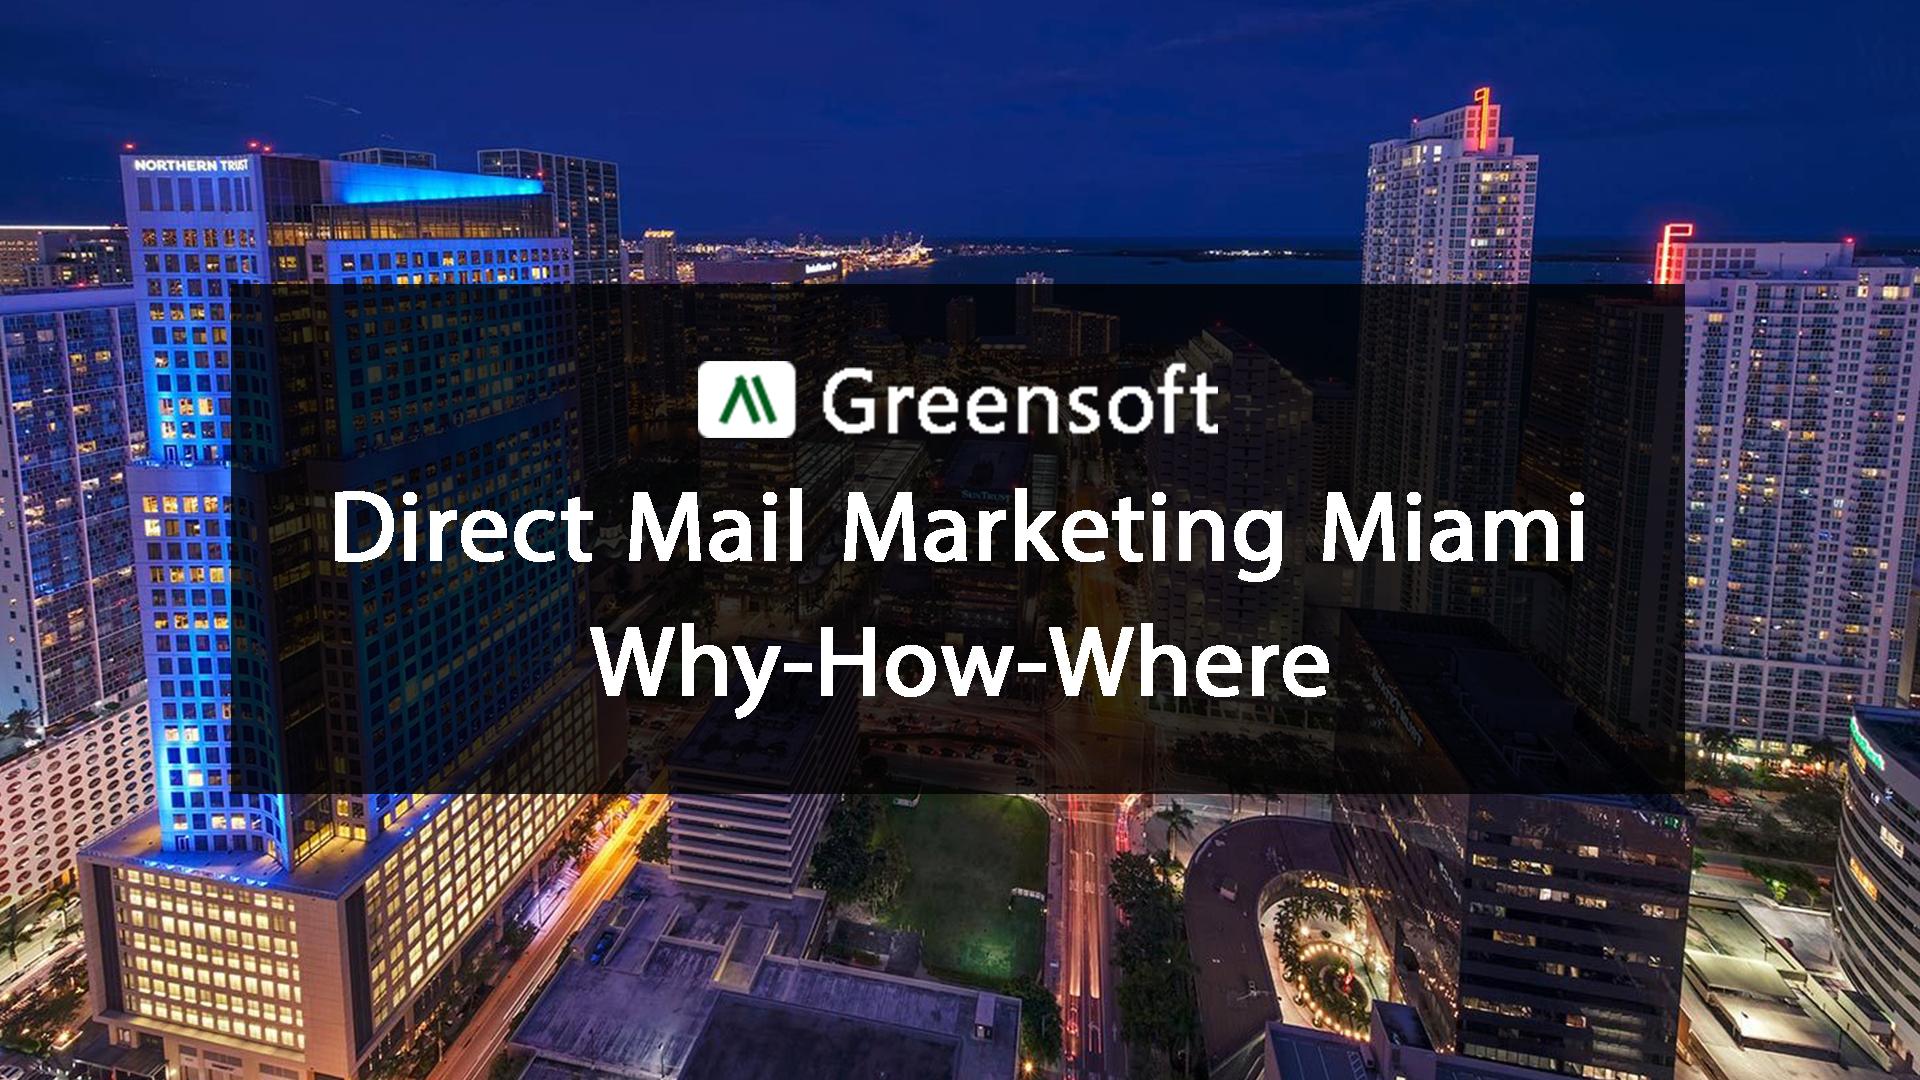 Direct mail marketing Miami, greensoft dhaka